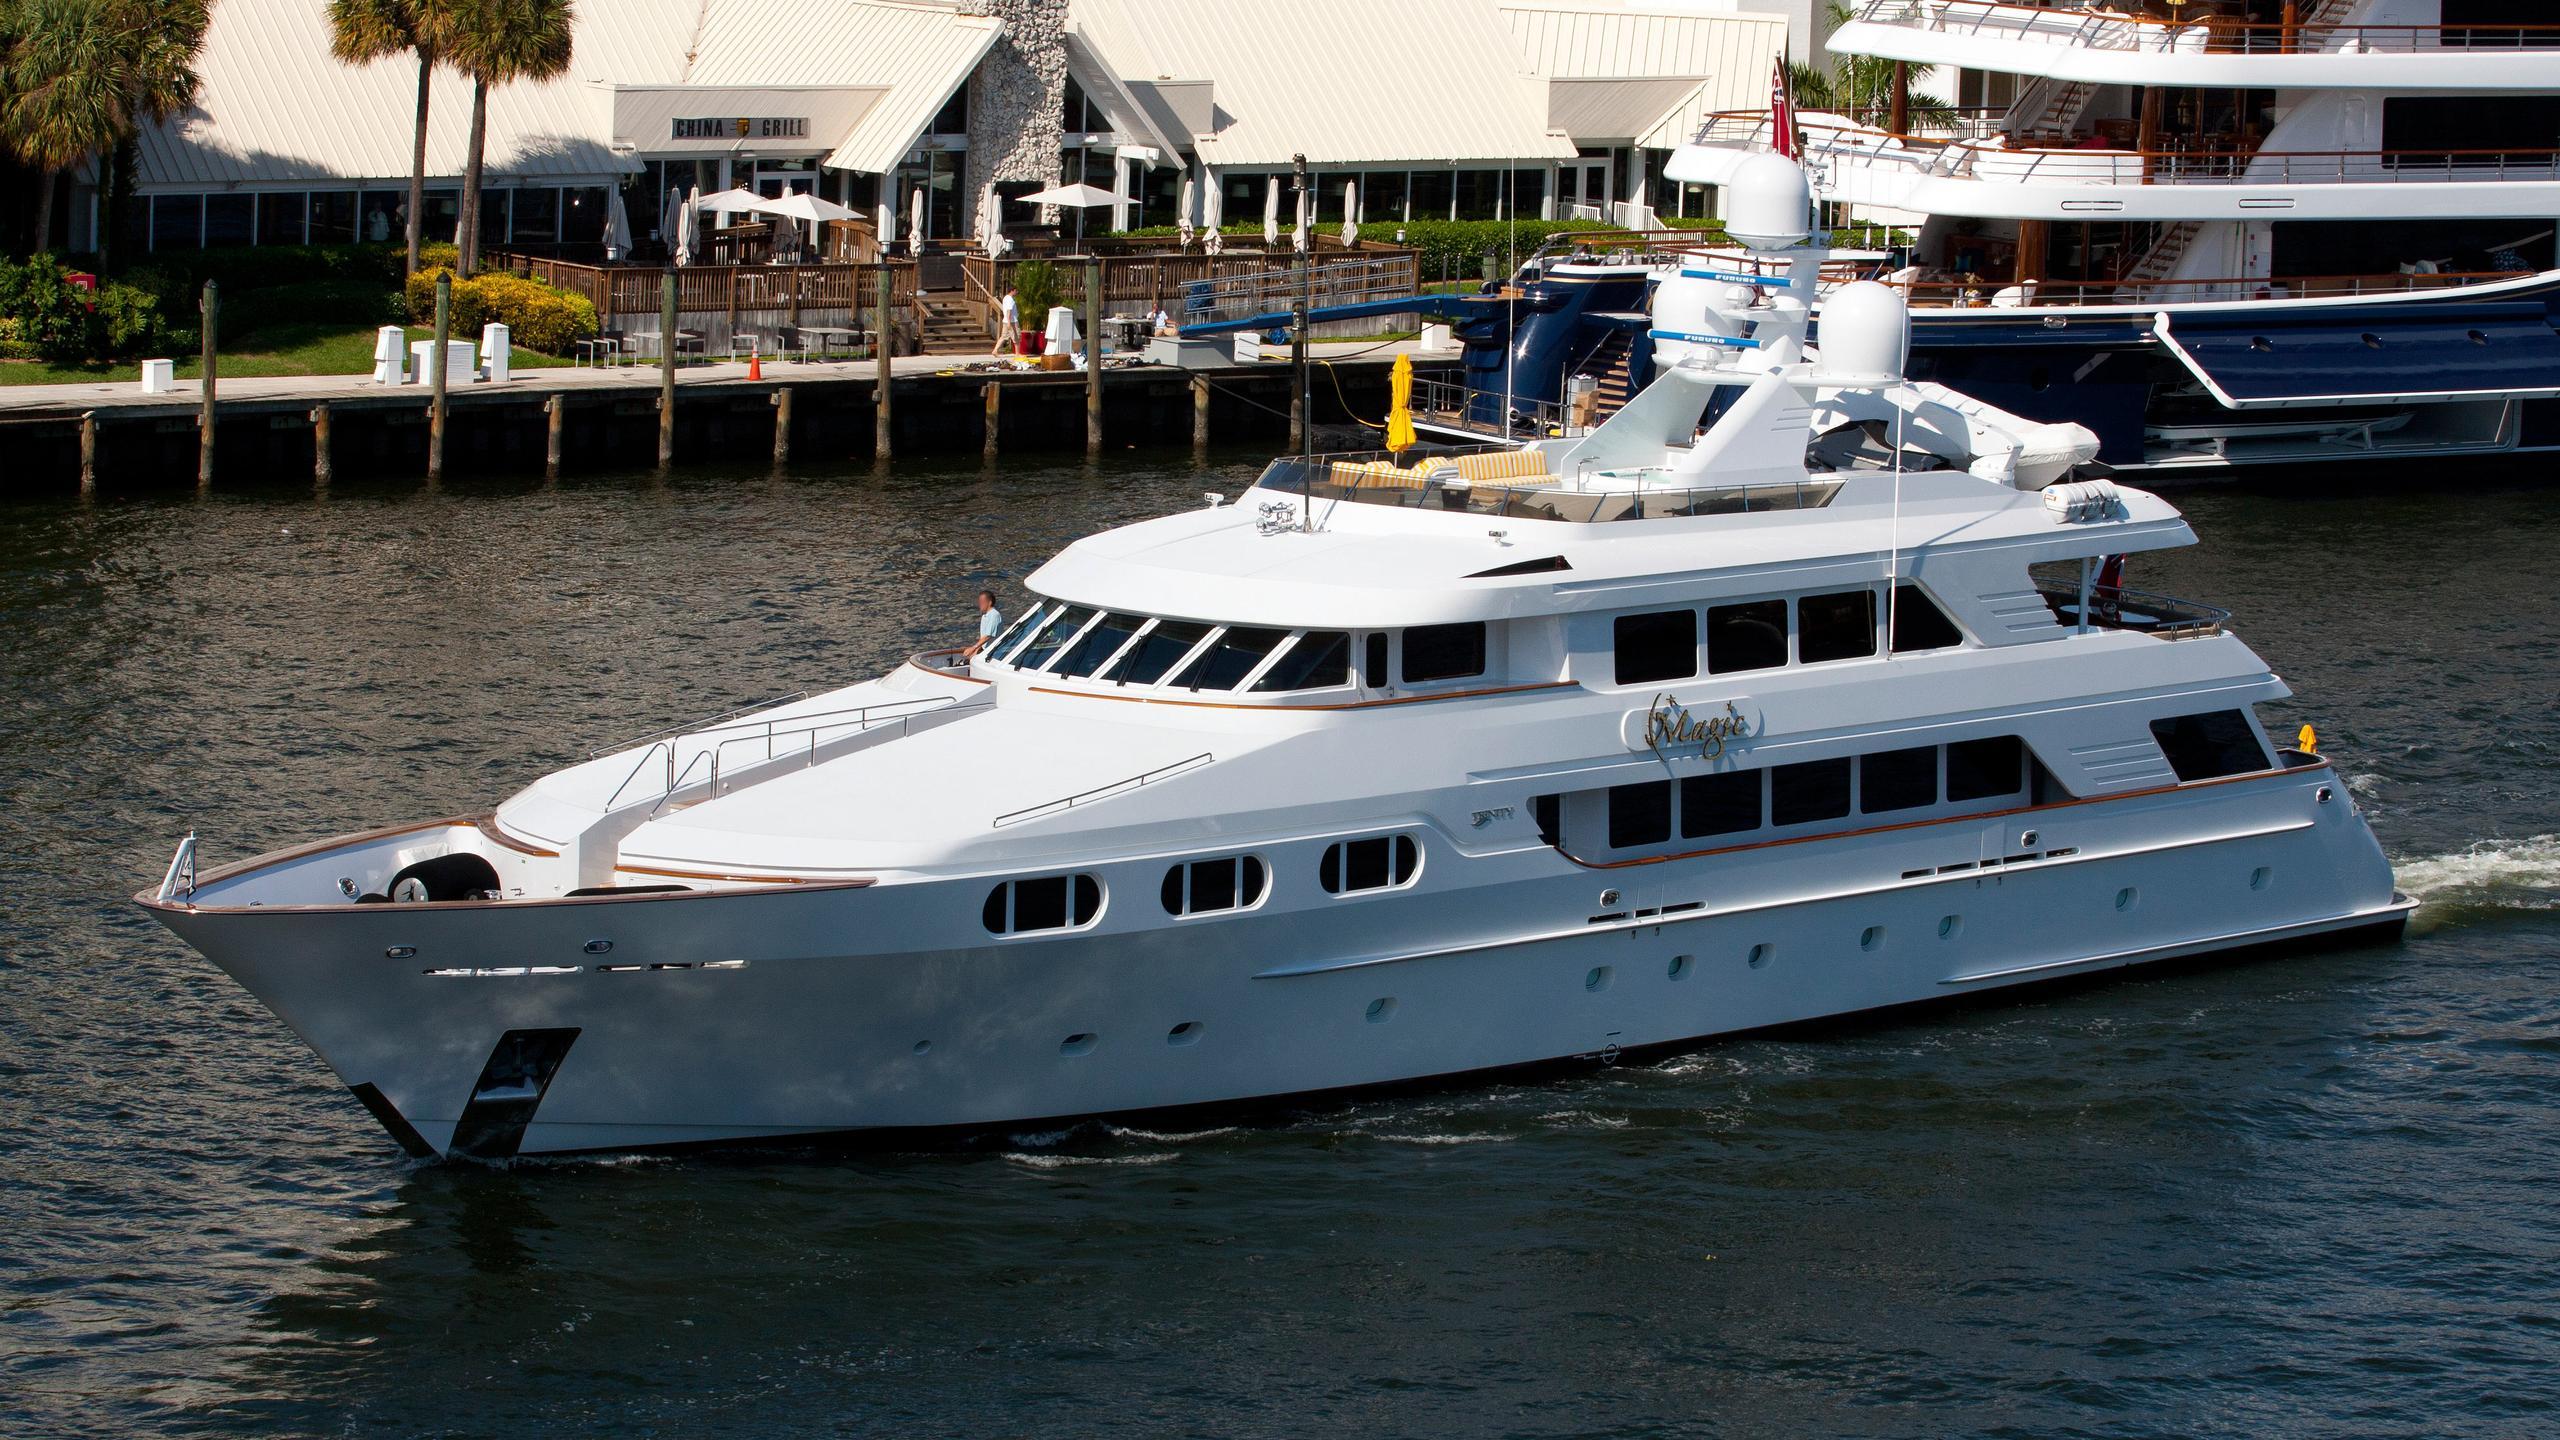 attitude-motor-yacht-trinity-1997-46m-running-half-profile